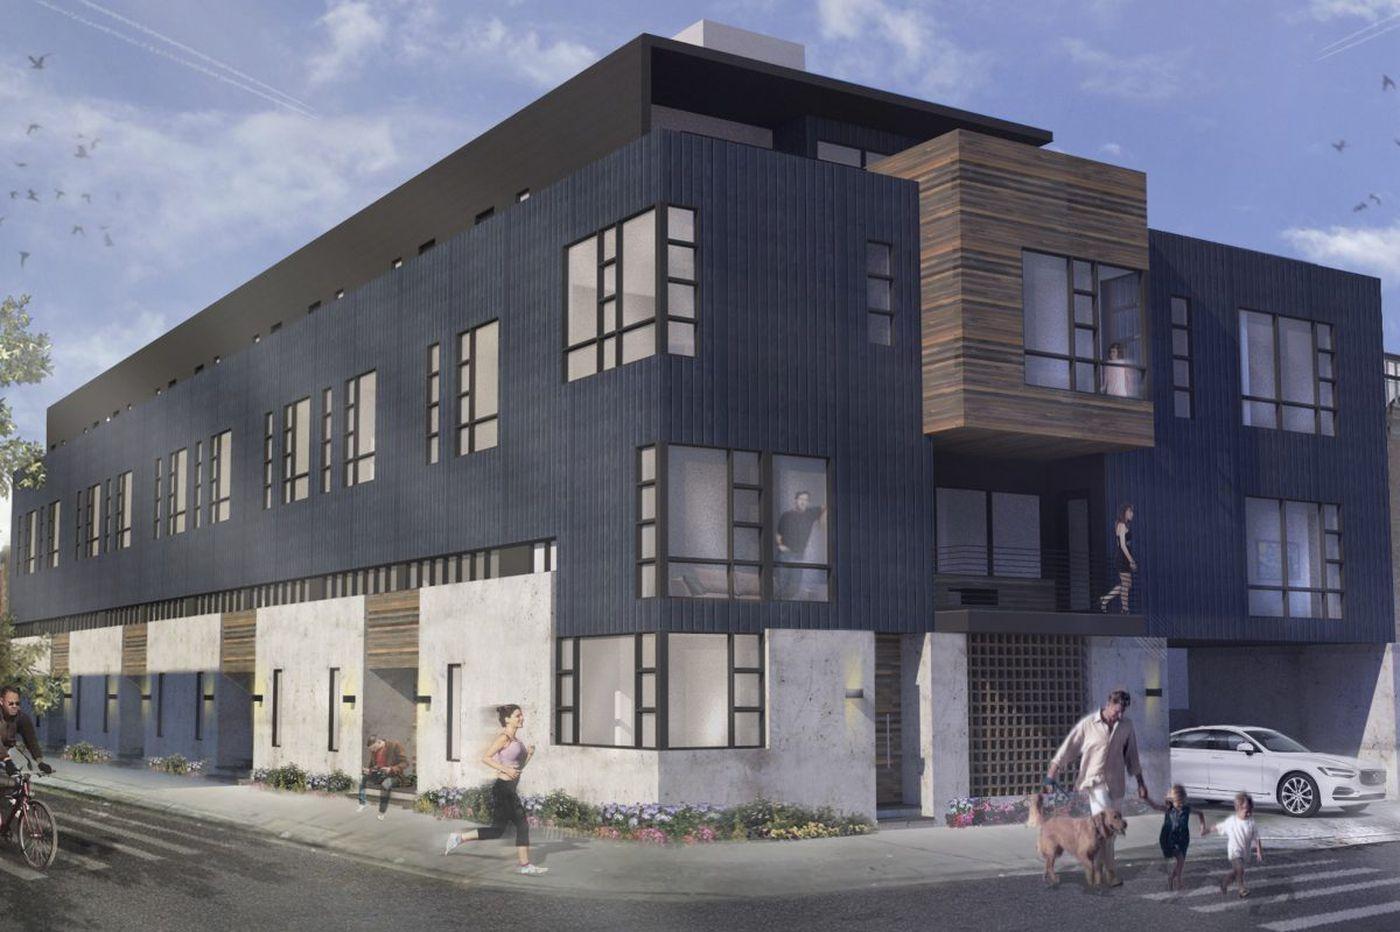 Developer PRDC plans high-end rowhouse complex near Berks rail station